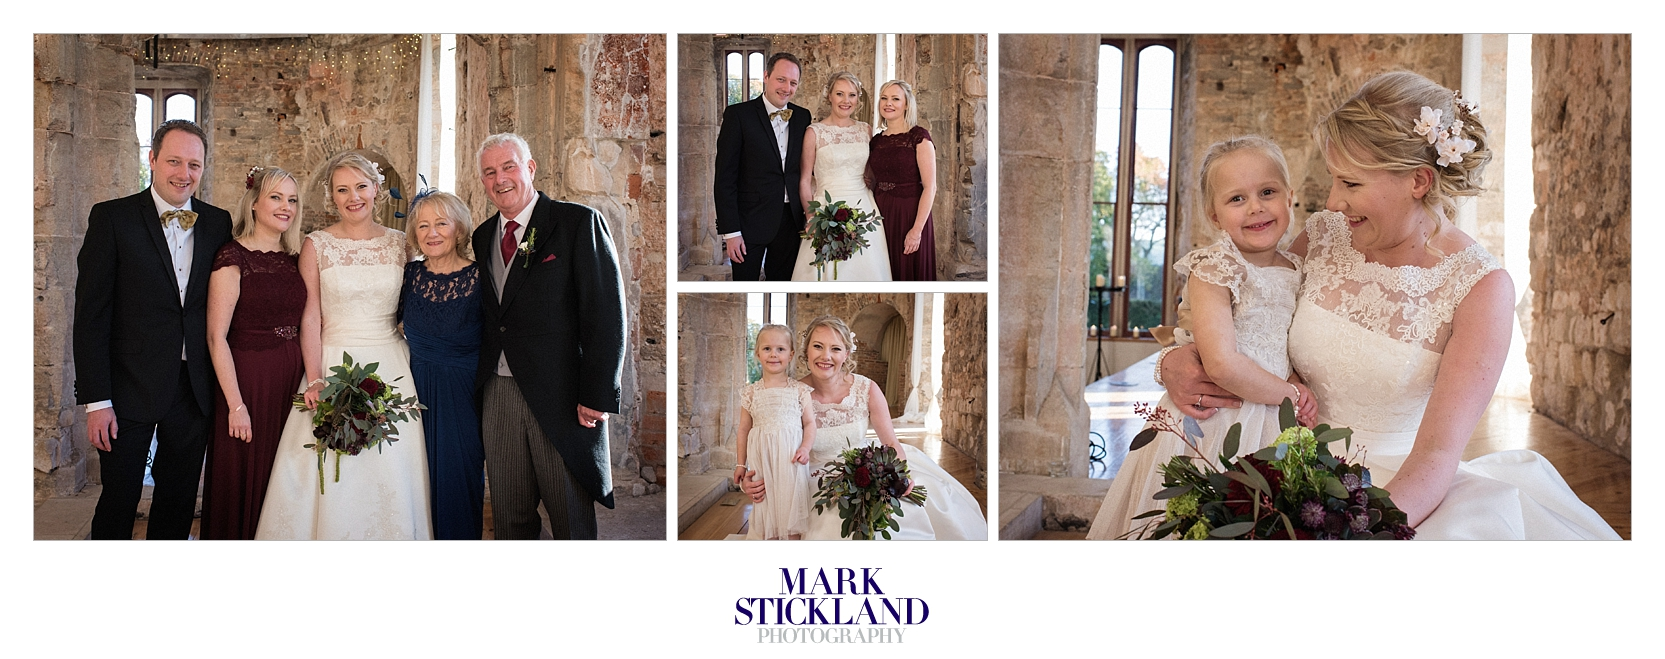 lulworth_castle_wedding_dorset_mark stickland photography.29